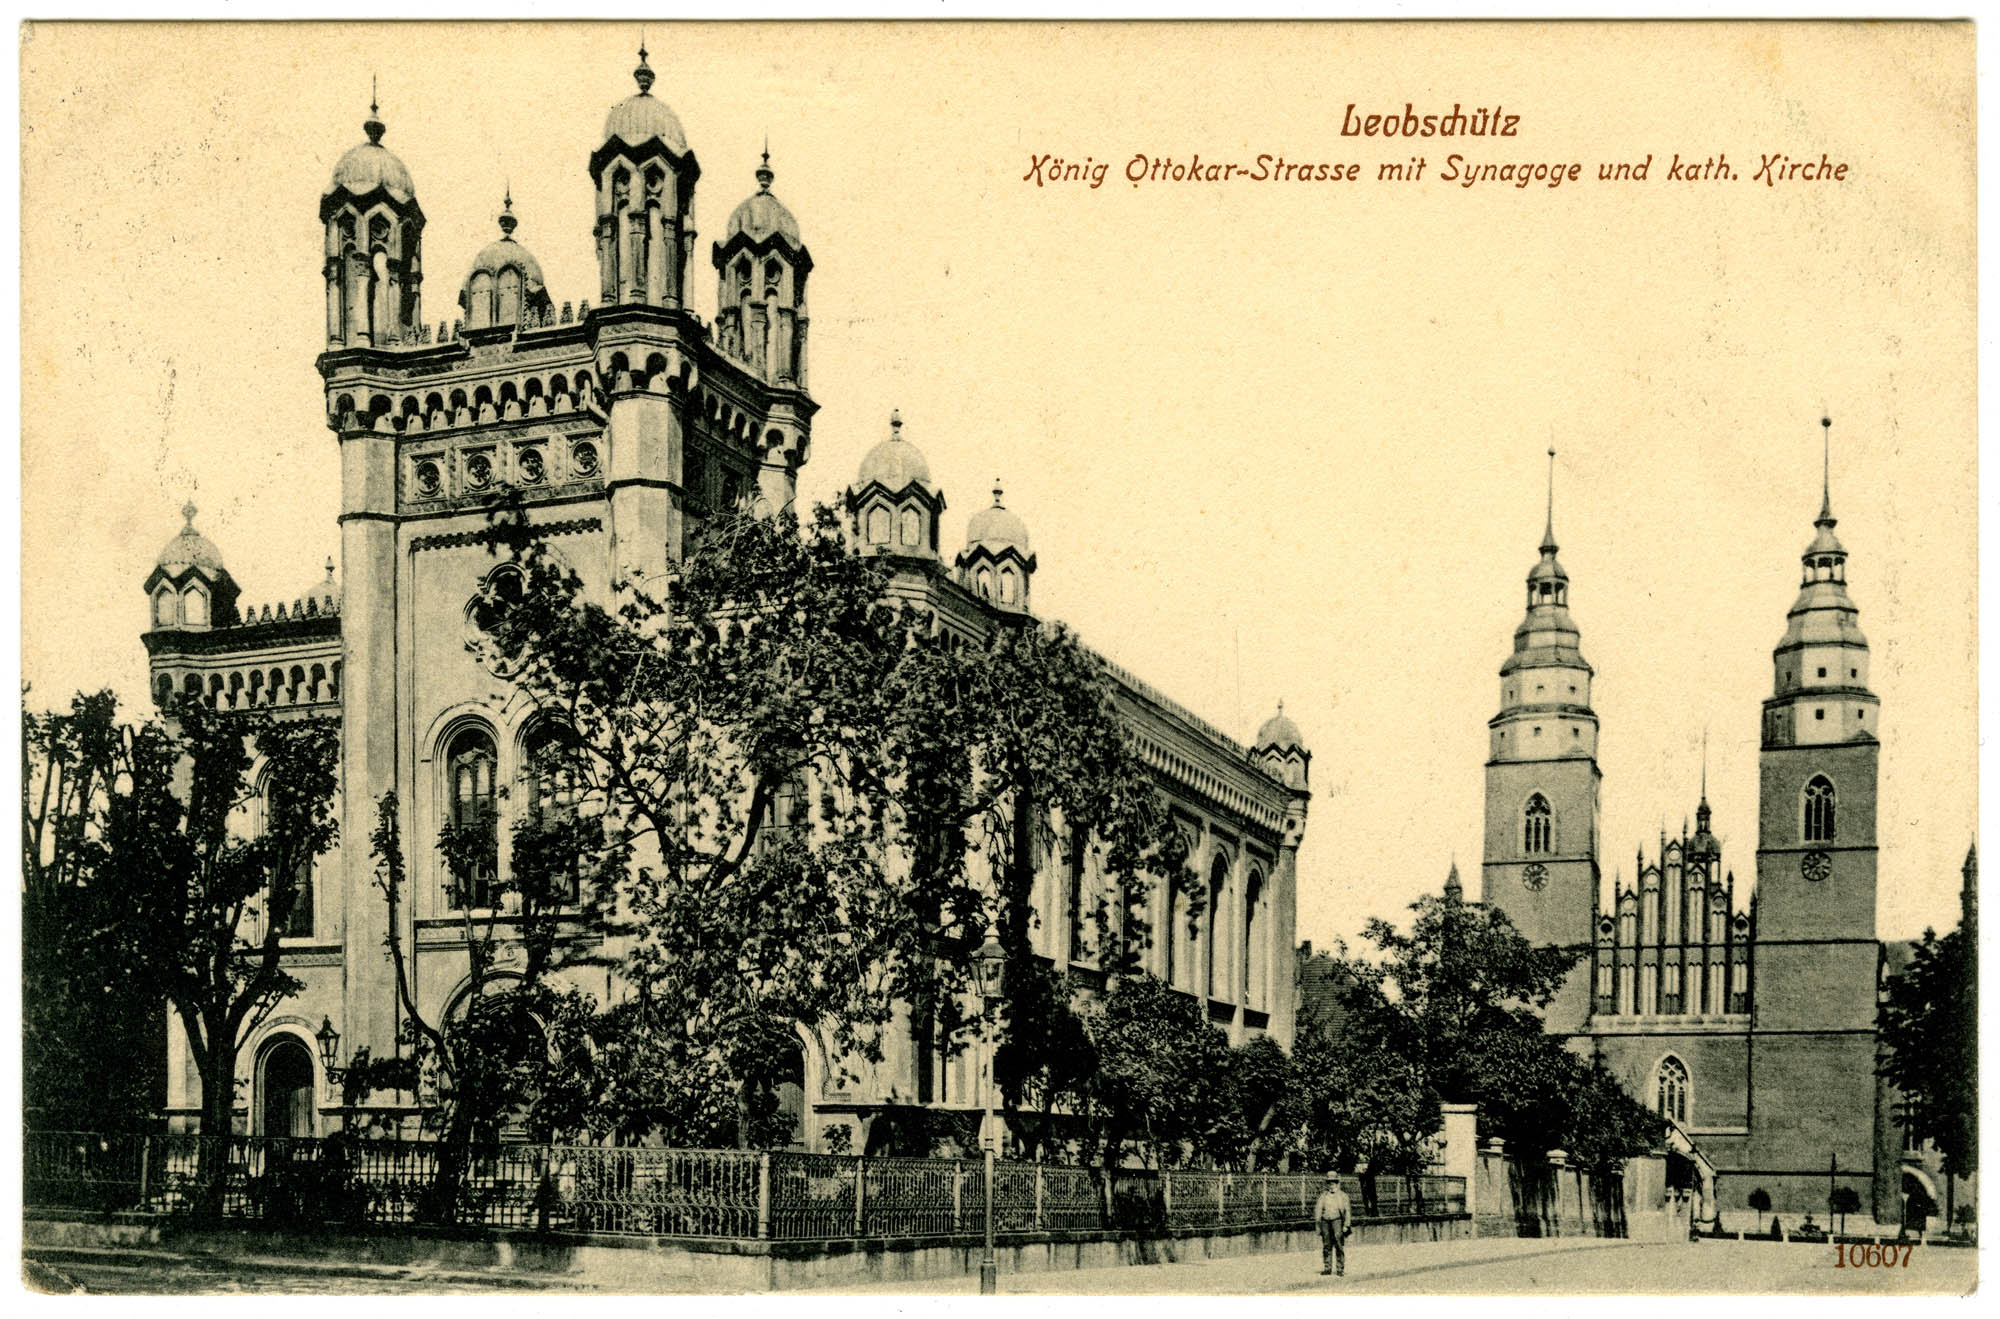 https://upload.wikimedia.org/wikipedia/commons/7/77/Leobsch%C3%BCtz_Synagogue.jpg